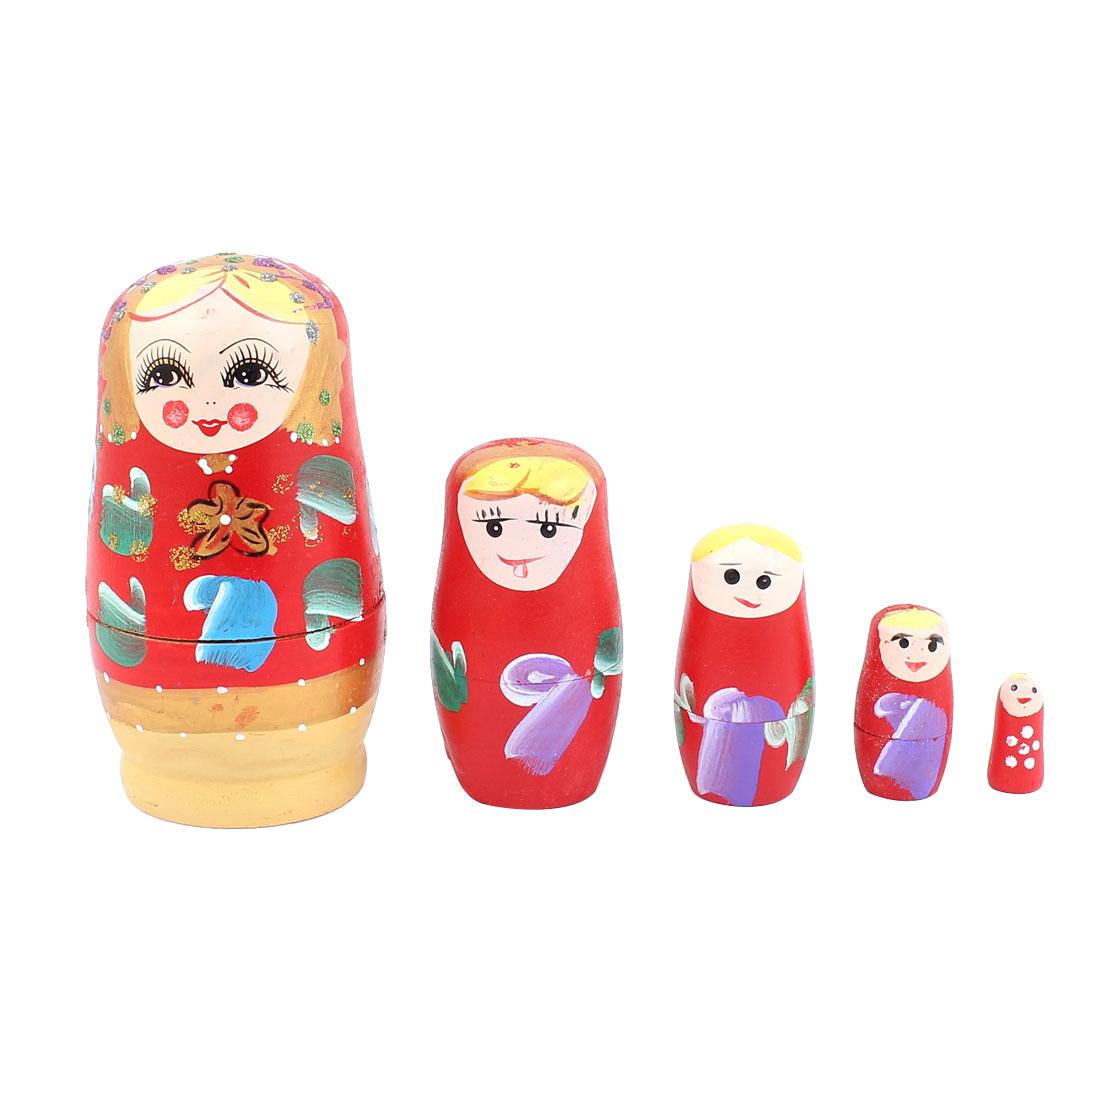 Russian Babushka Flowers Painted Nesting Matryoshka Doll Red 5 in 1